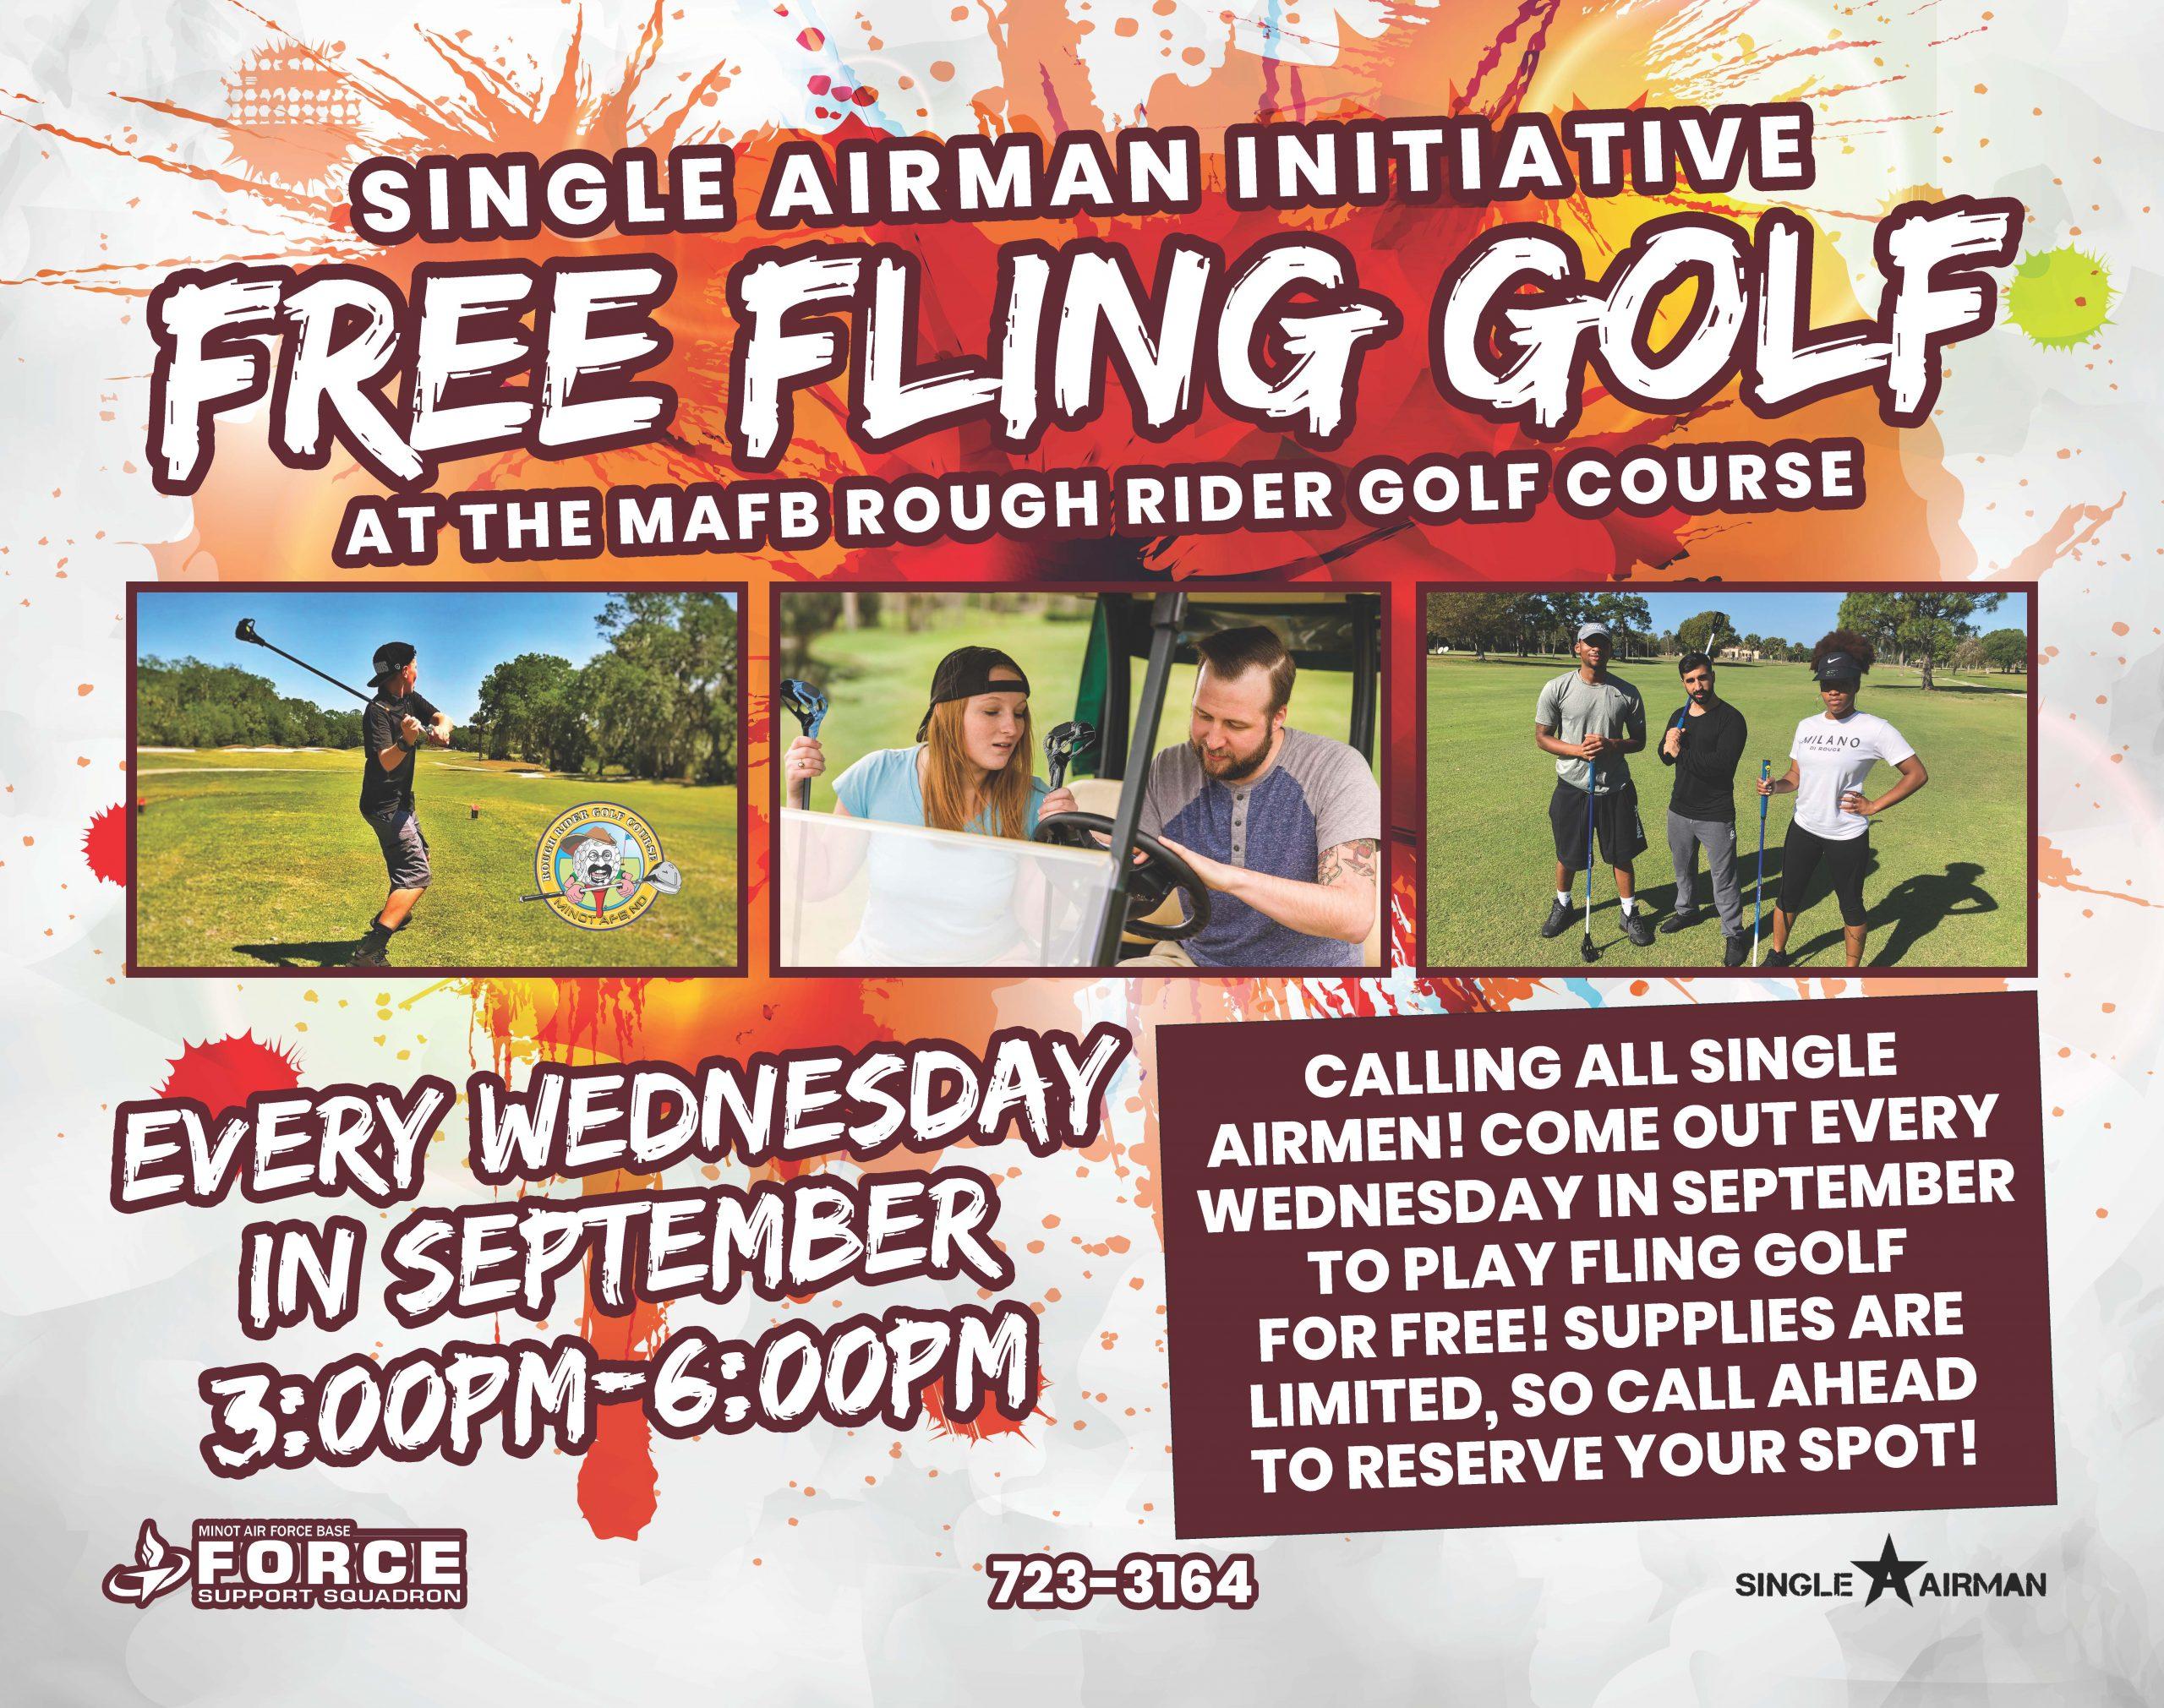 Single Airman Free Fling Golf